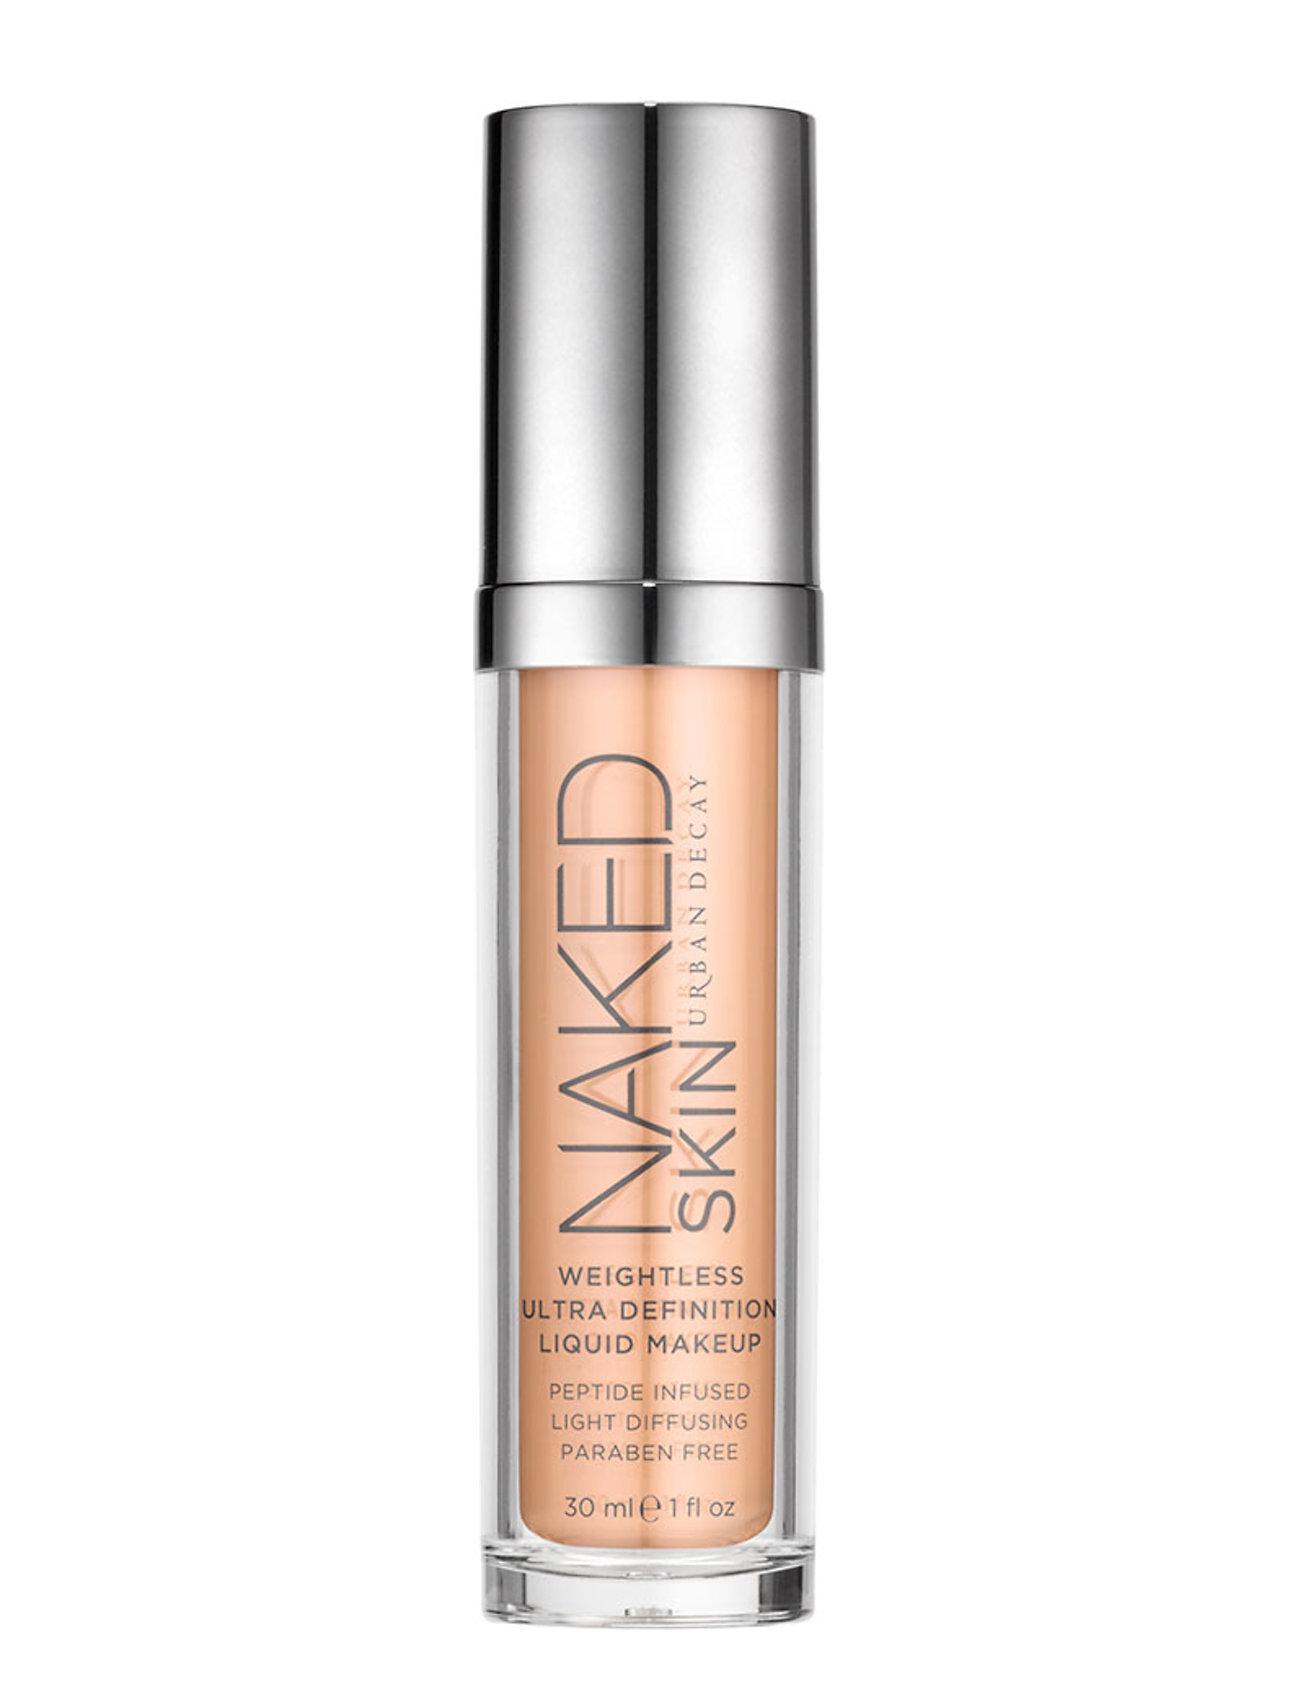 0.5 Naked Skin Liquid Makeup Meikkivoide Meikki Urban Decay